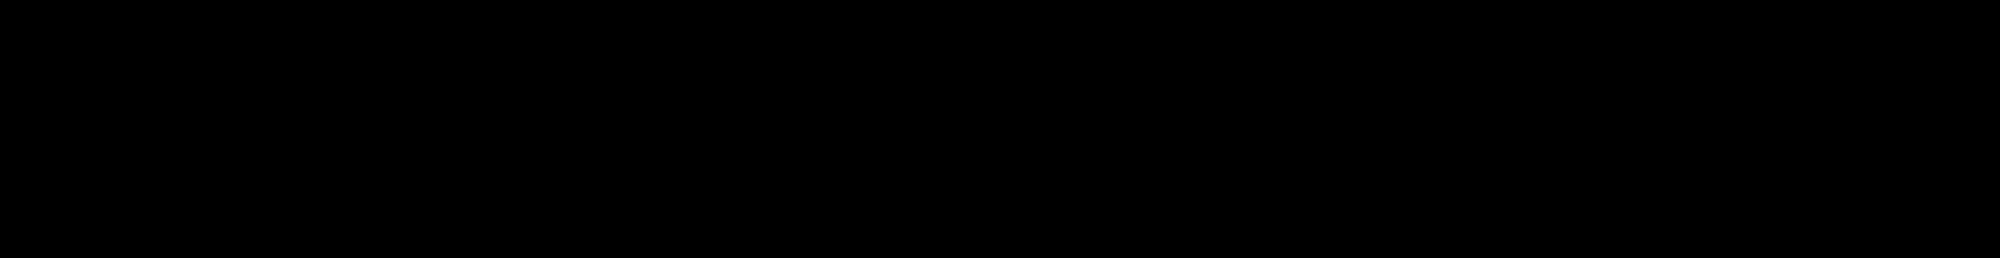 black and white download File logo svg wikimedia. Supernatural vector.